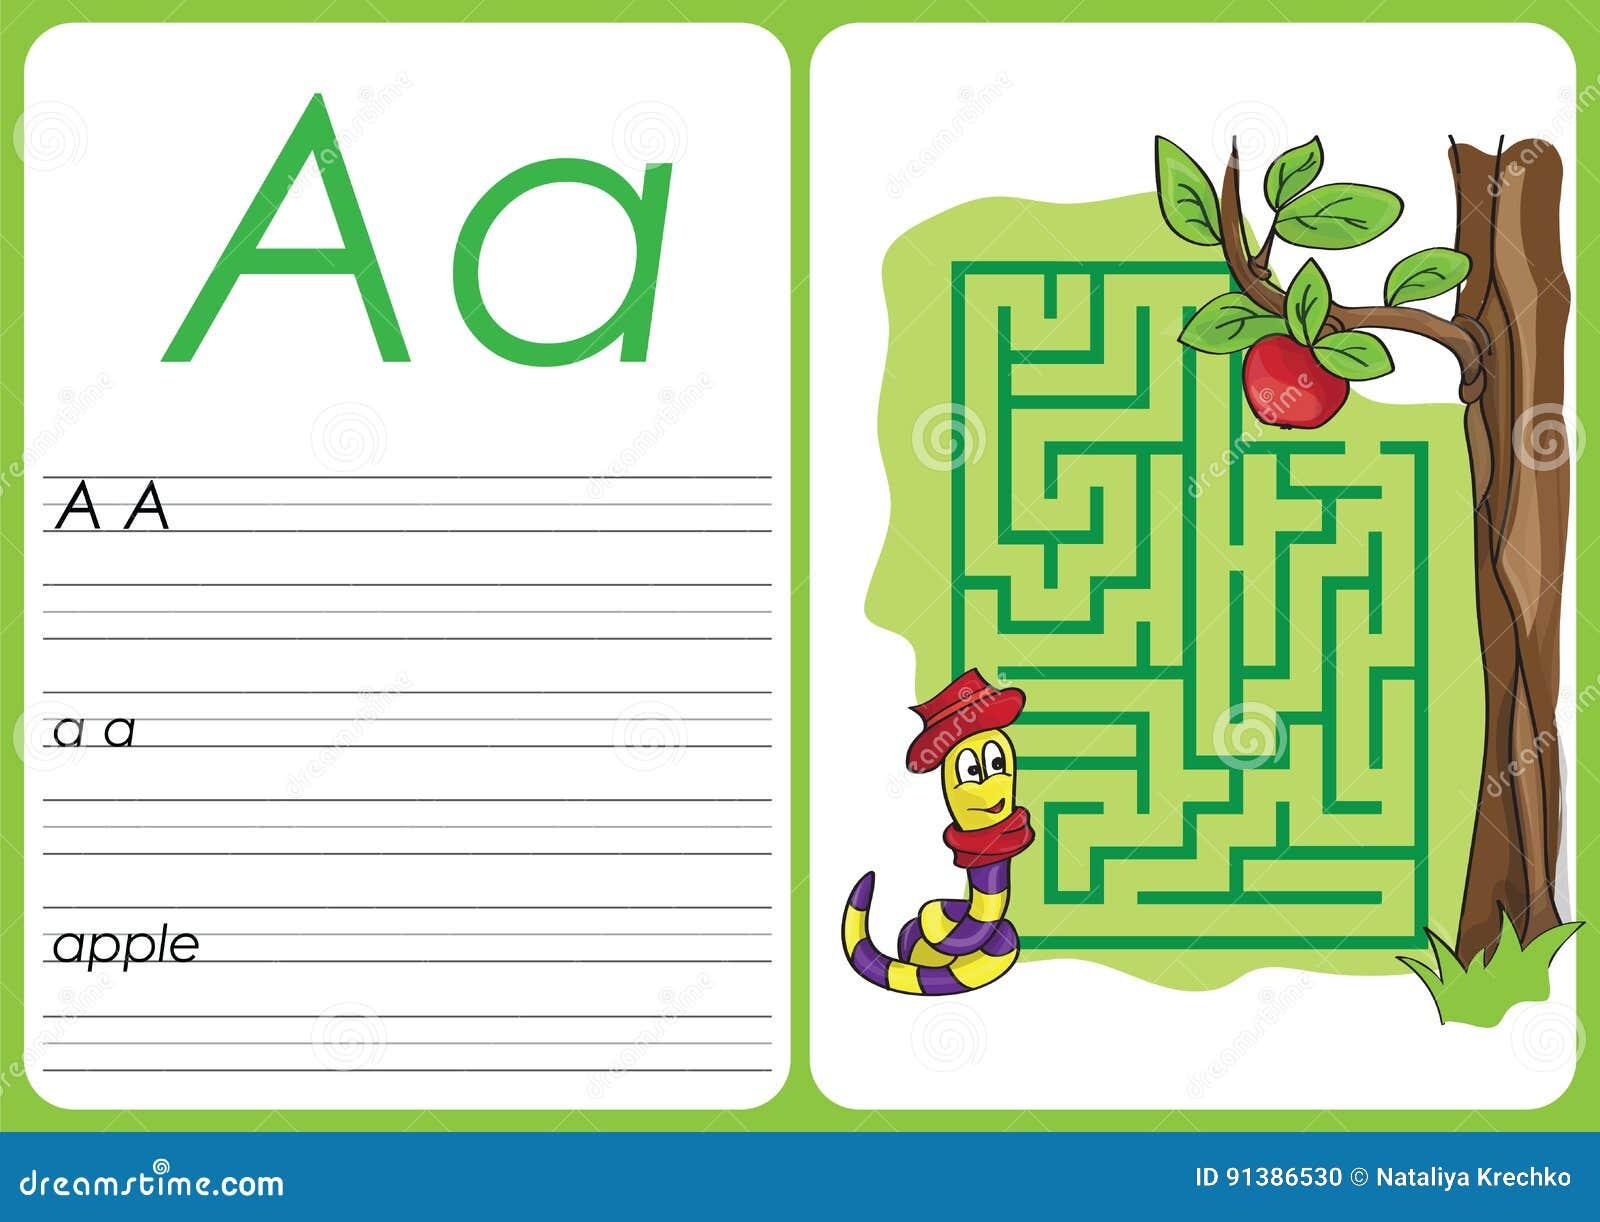 Alphabet A-Z - Puzzle Worksheet - A - Apple Stock Vector ...